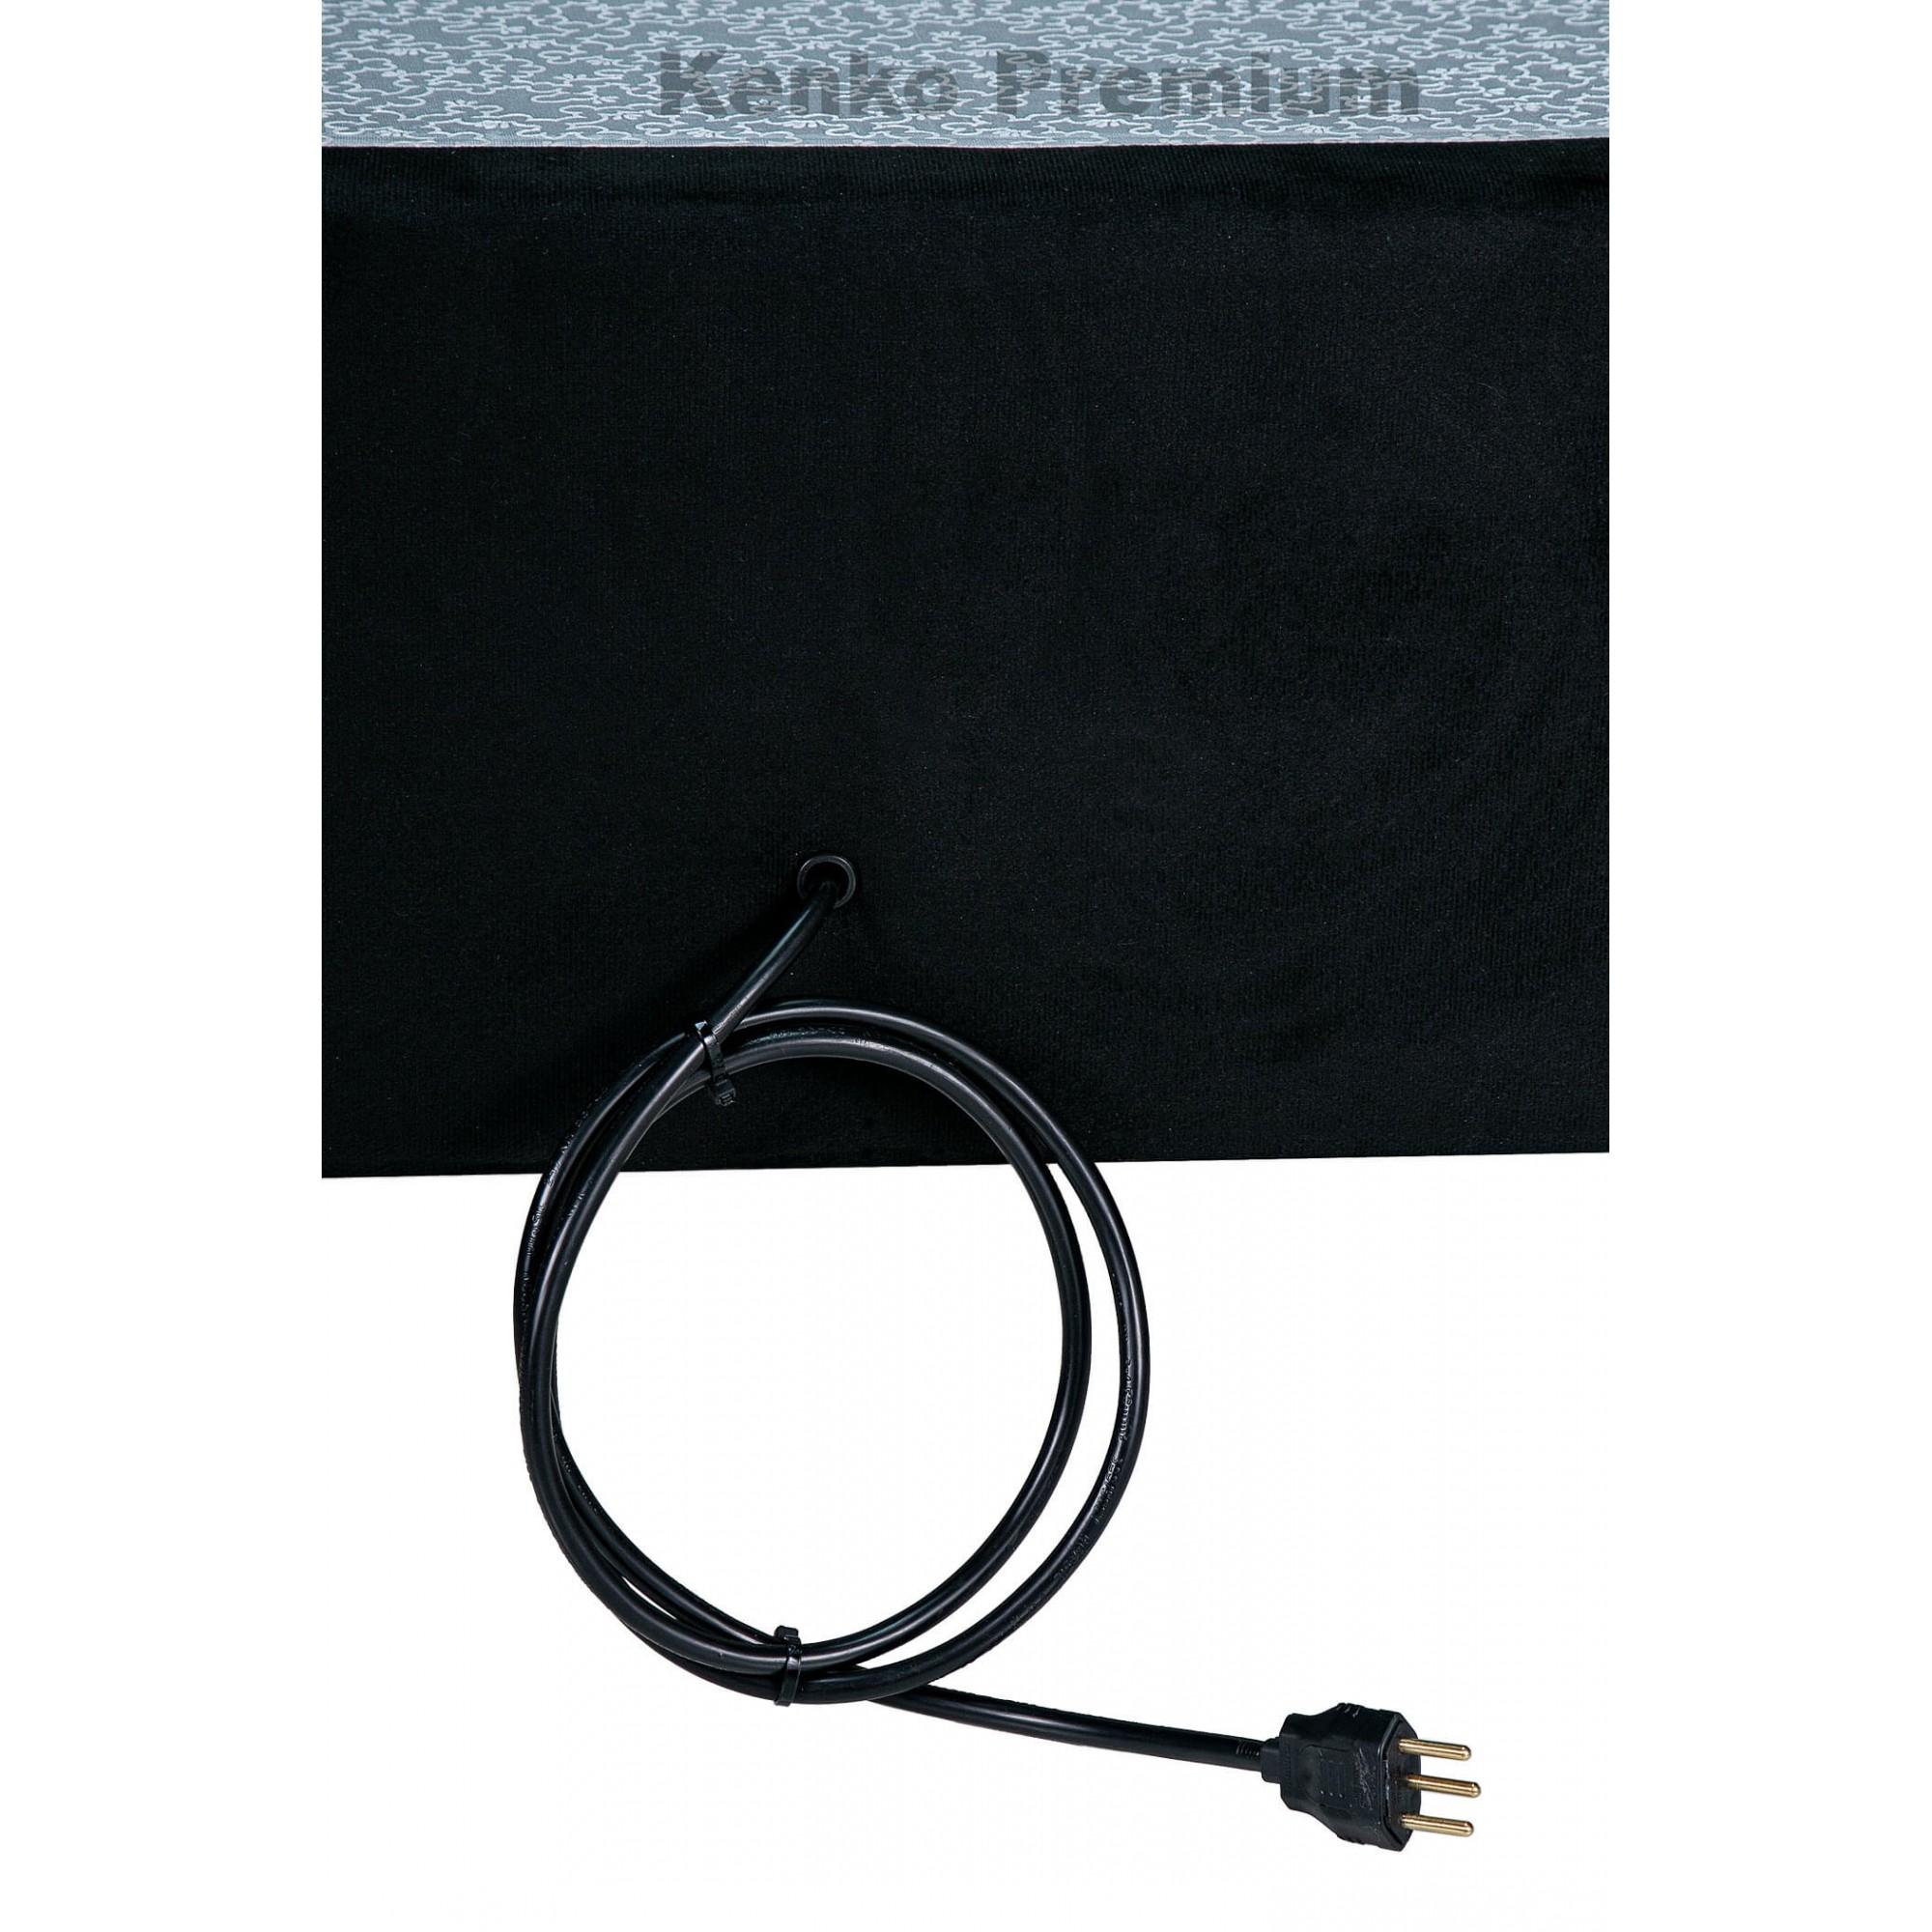 Box Base Para Colchão Iluminado  Solteiro 0,88x1,88 Usb C/kit Conect Suede Kenko Premium   - Kenko Premium Colchões